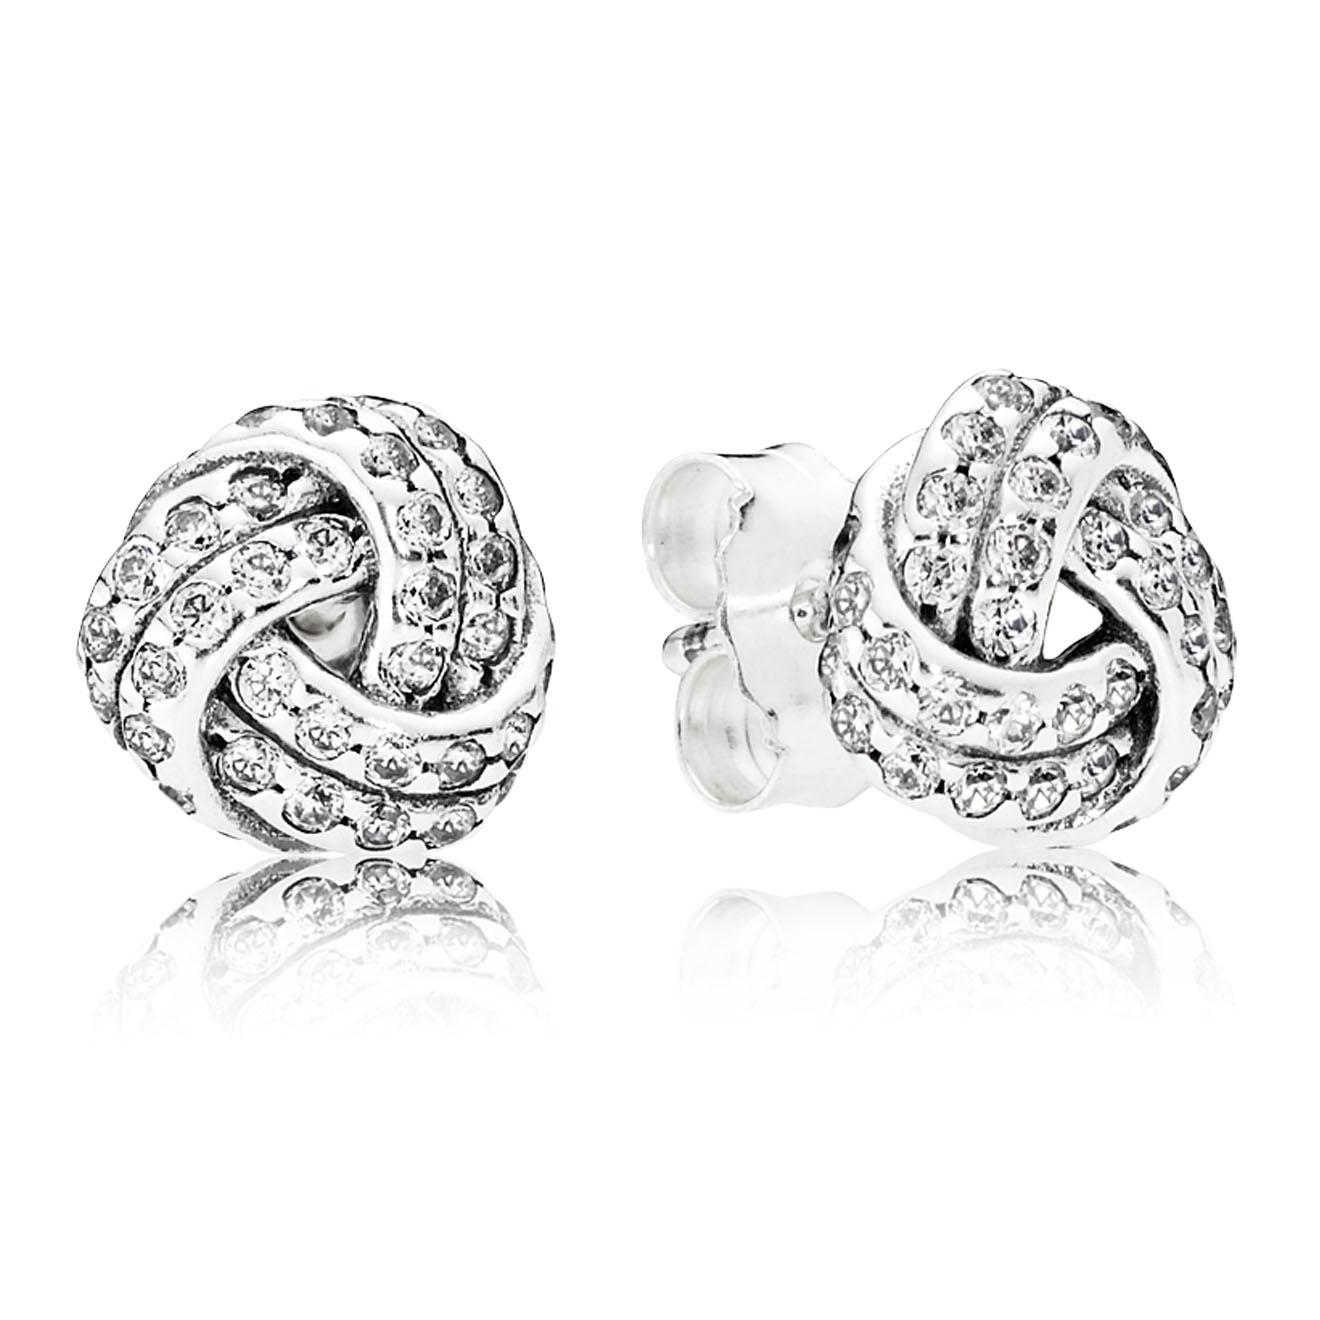 Sparkling Love Knot Ring Pandora Pancharmbracelets Com